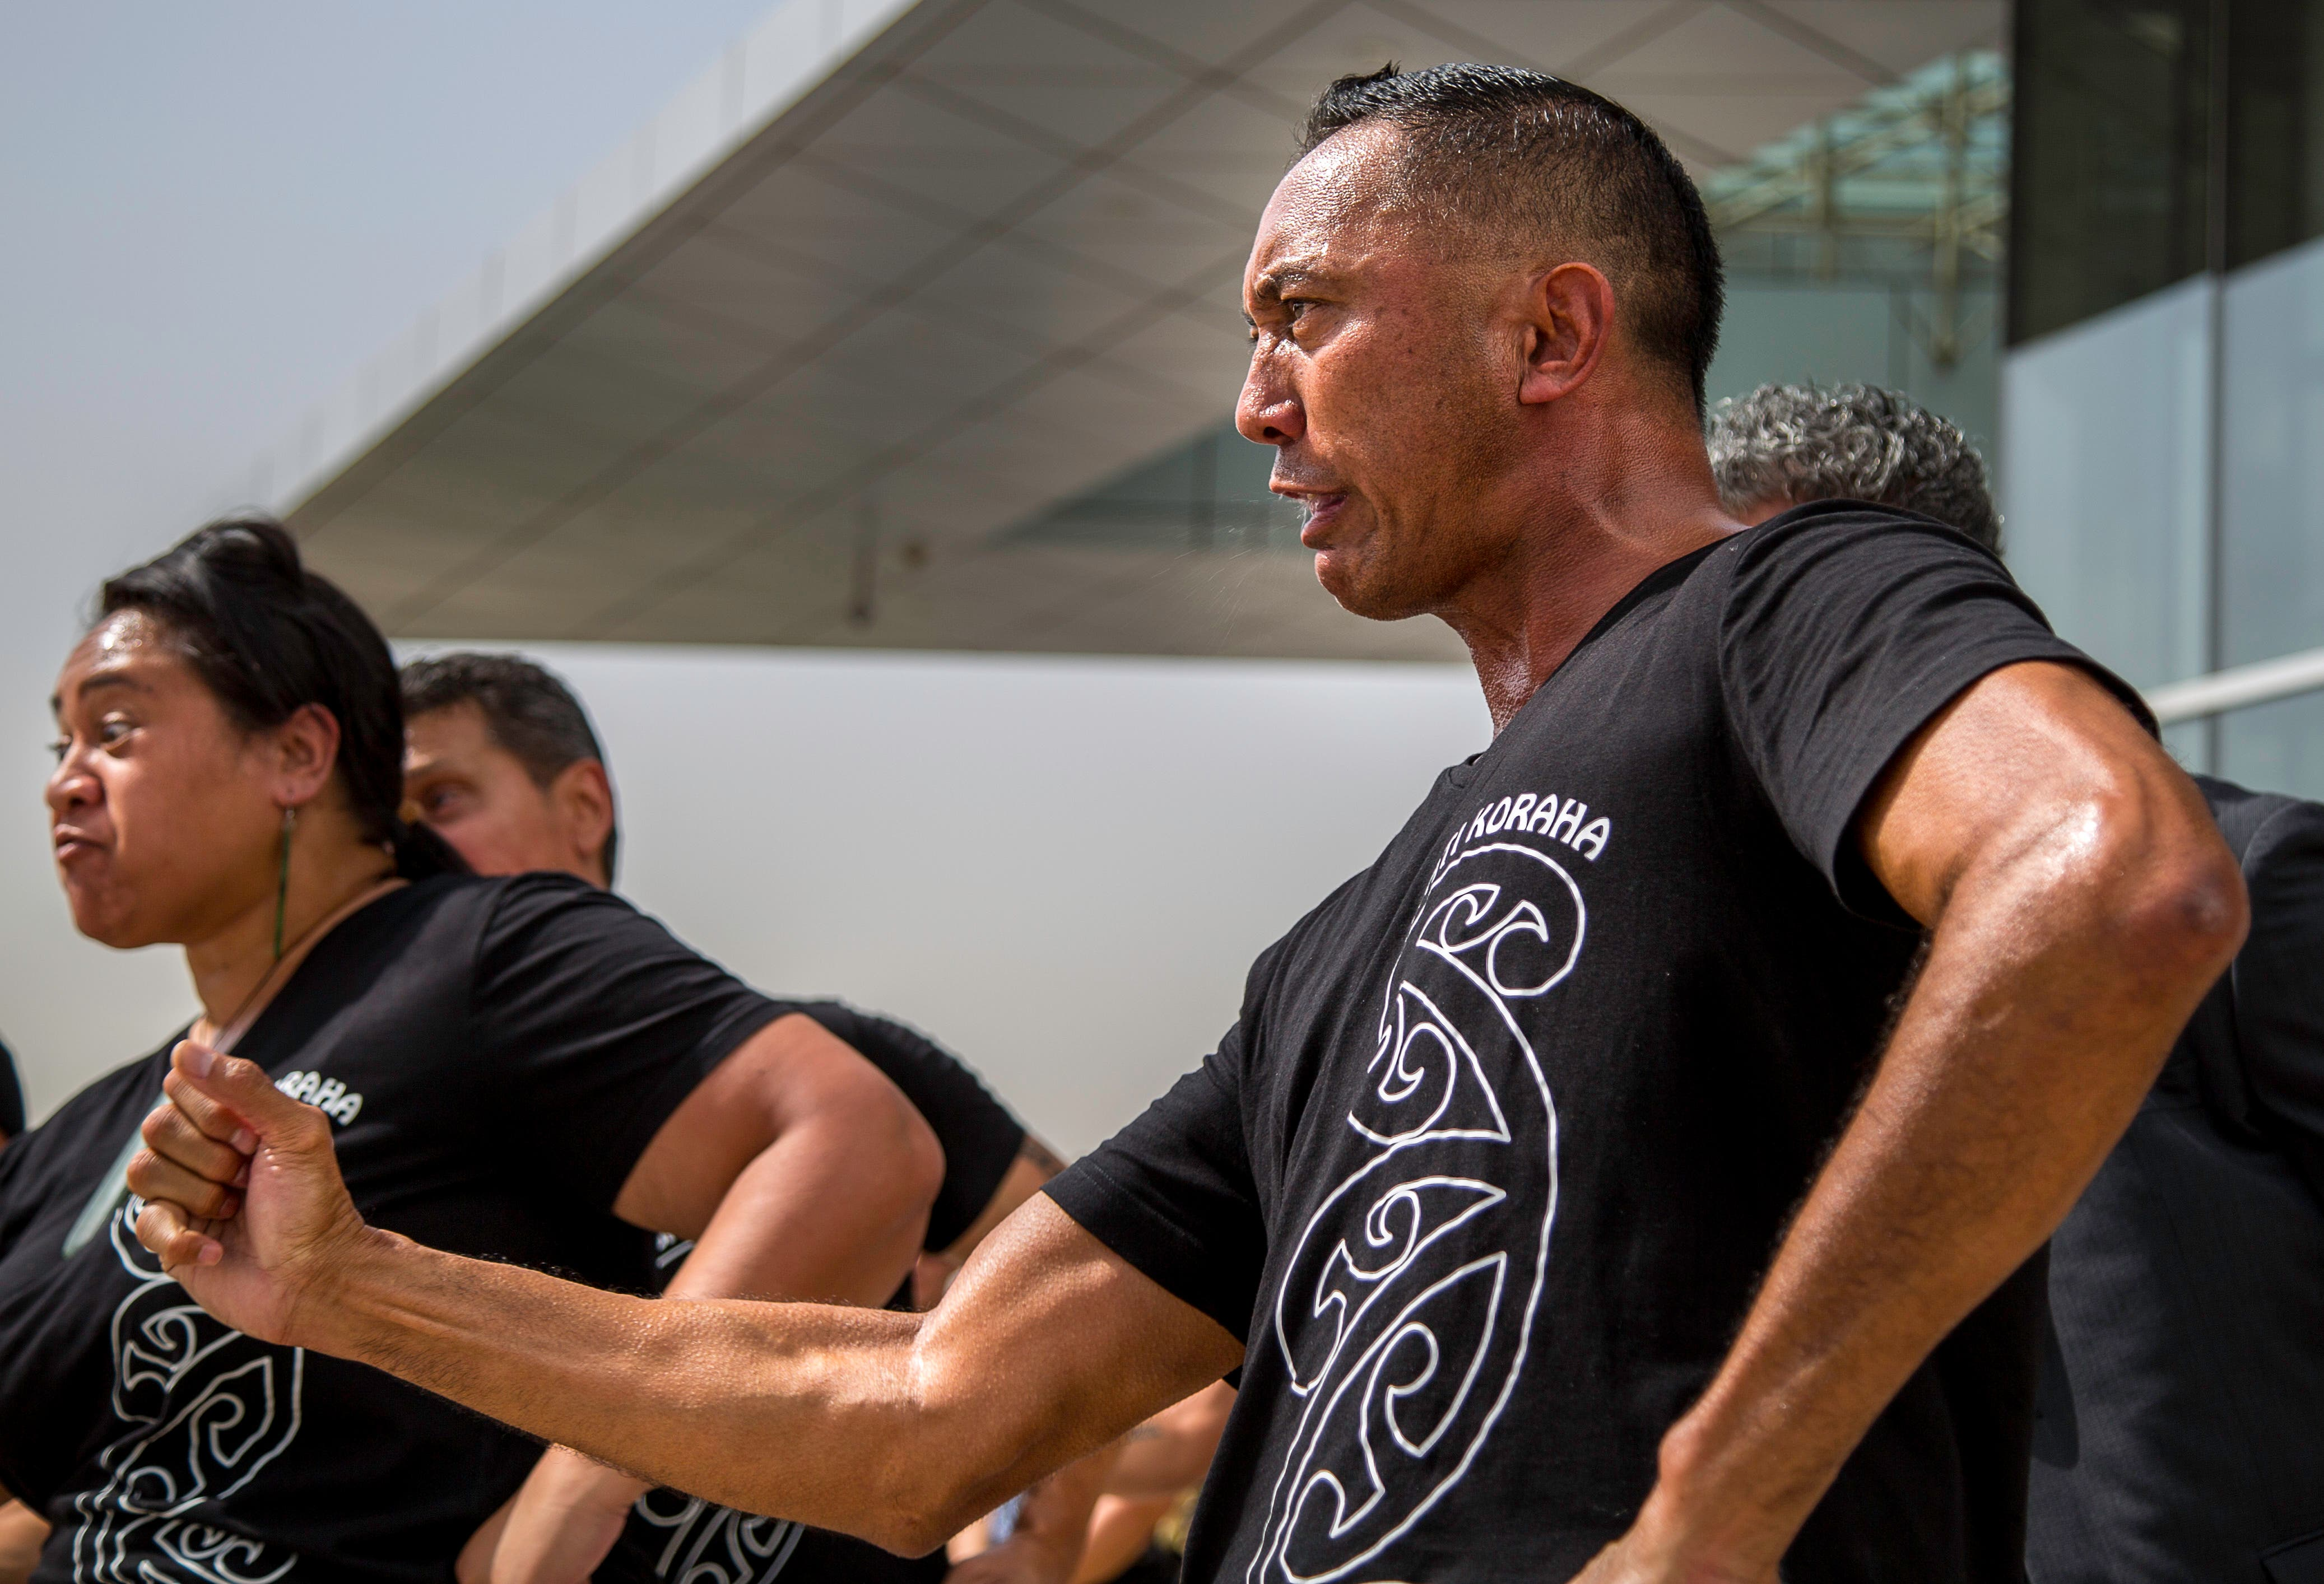 Members of a Maori cultural group perform the Haka (Amanda Fisher)